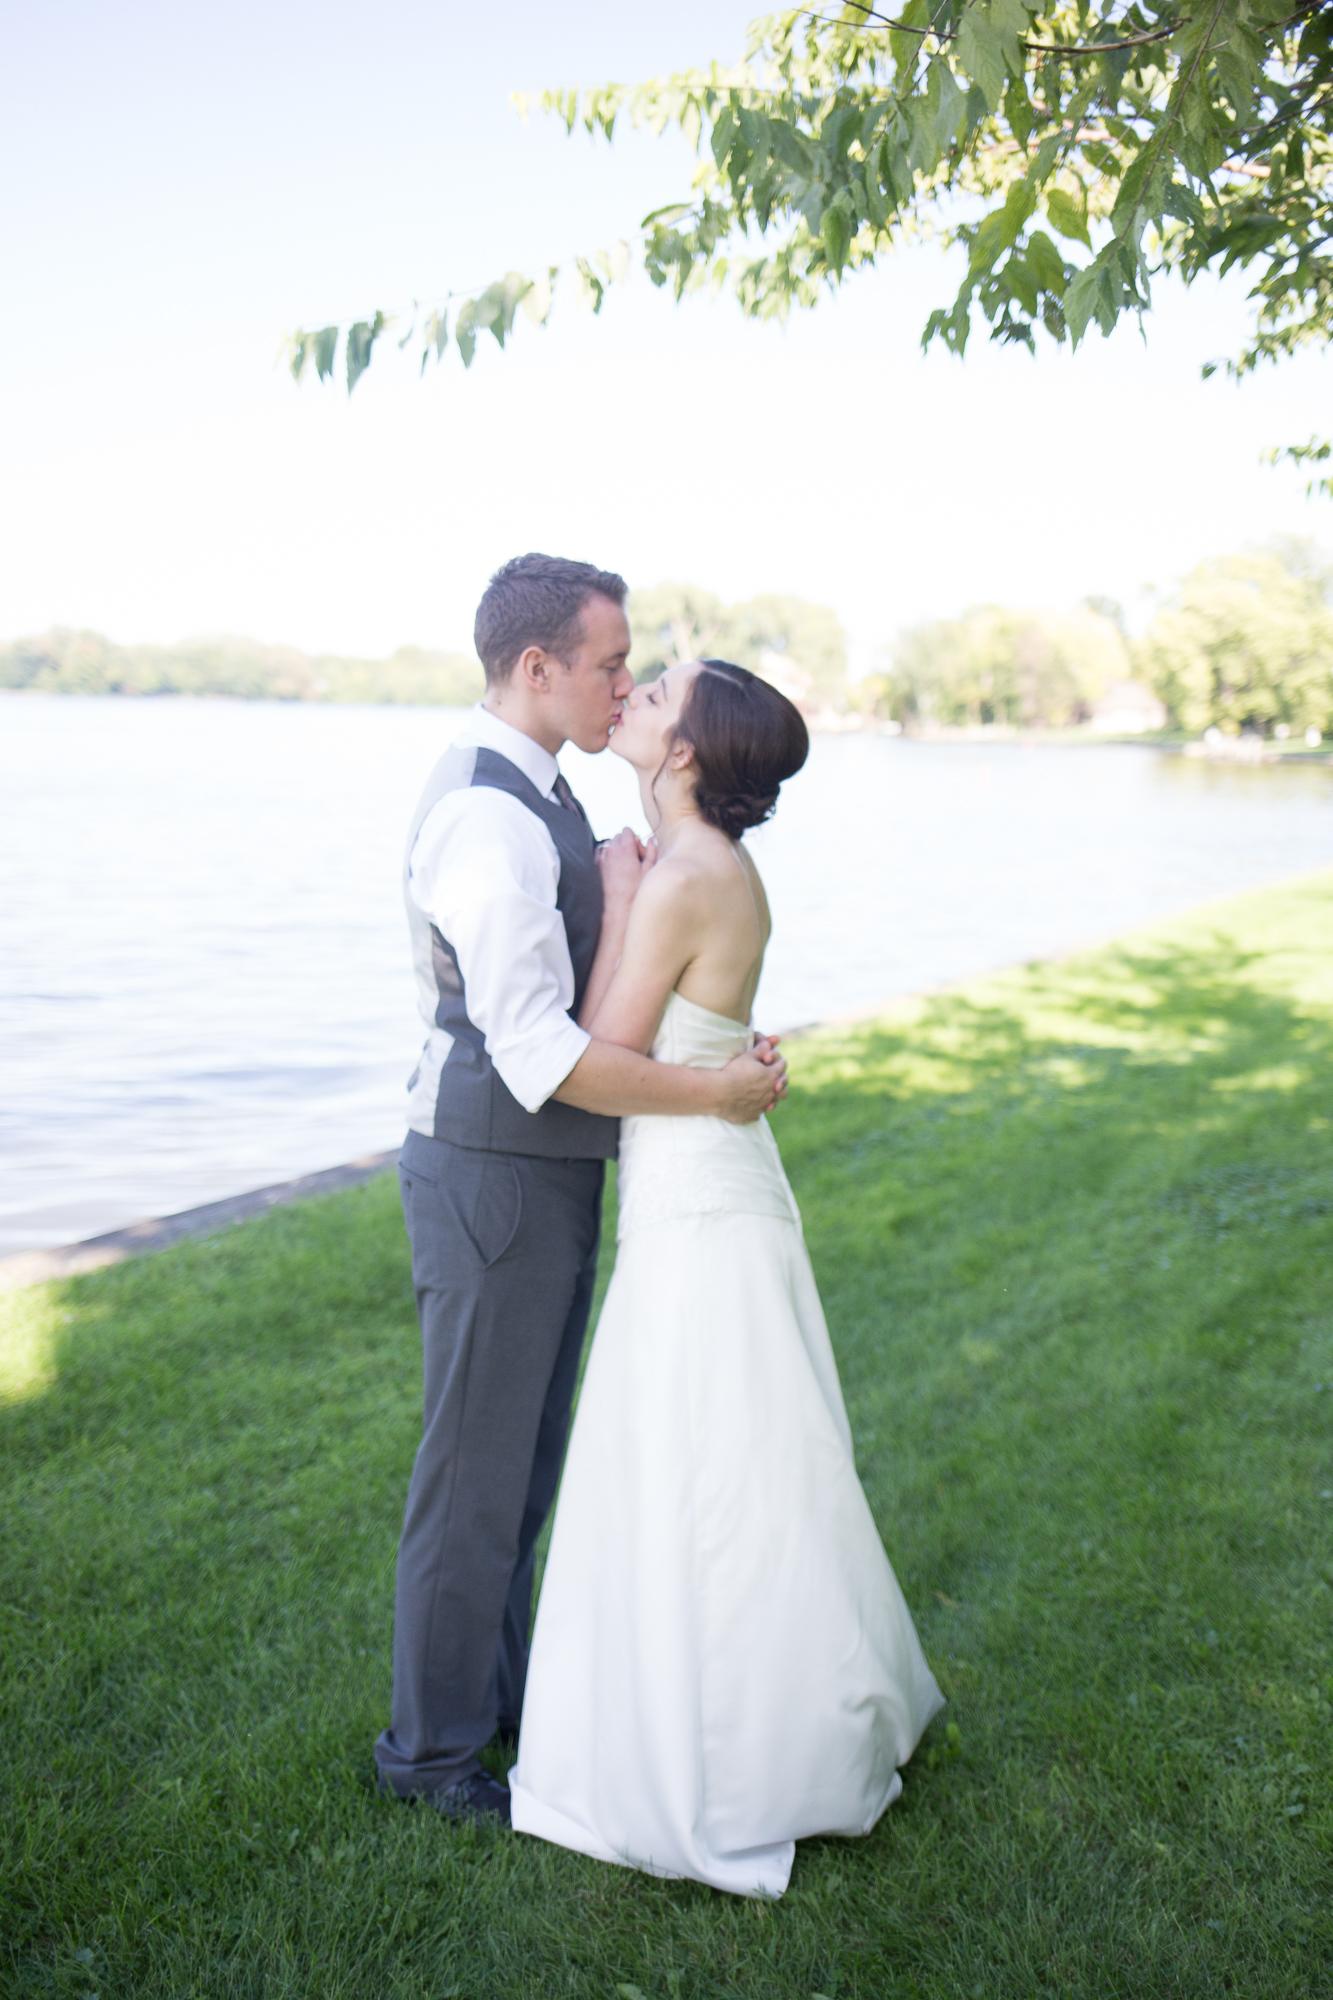 Neenah Wedding at Riverside Park in Wisconsin -Whit Meza Photography